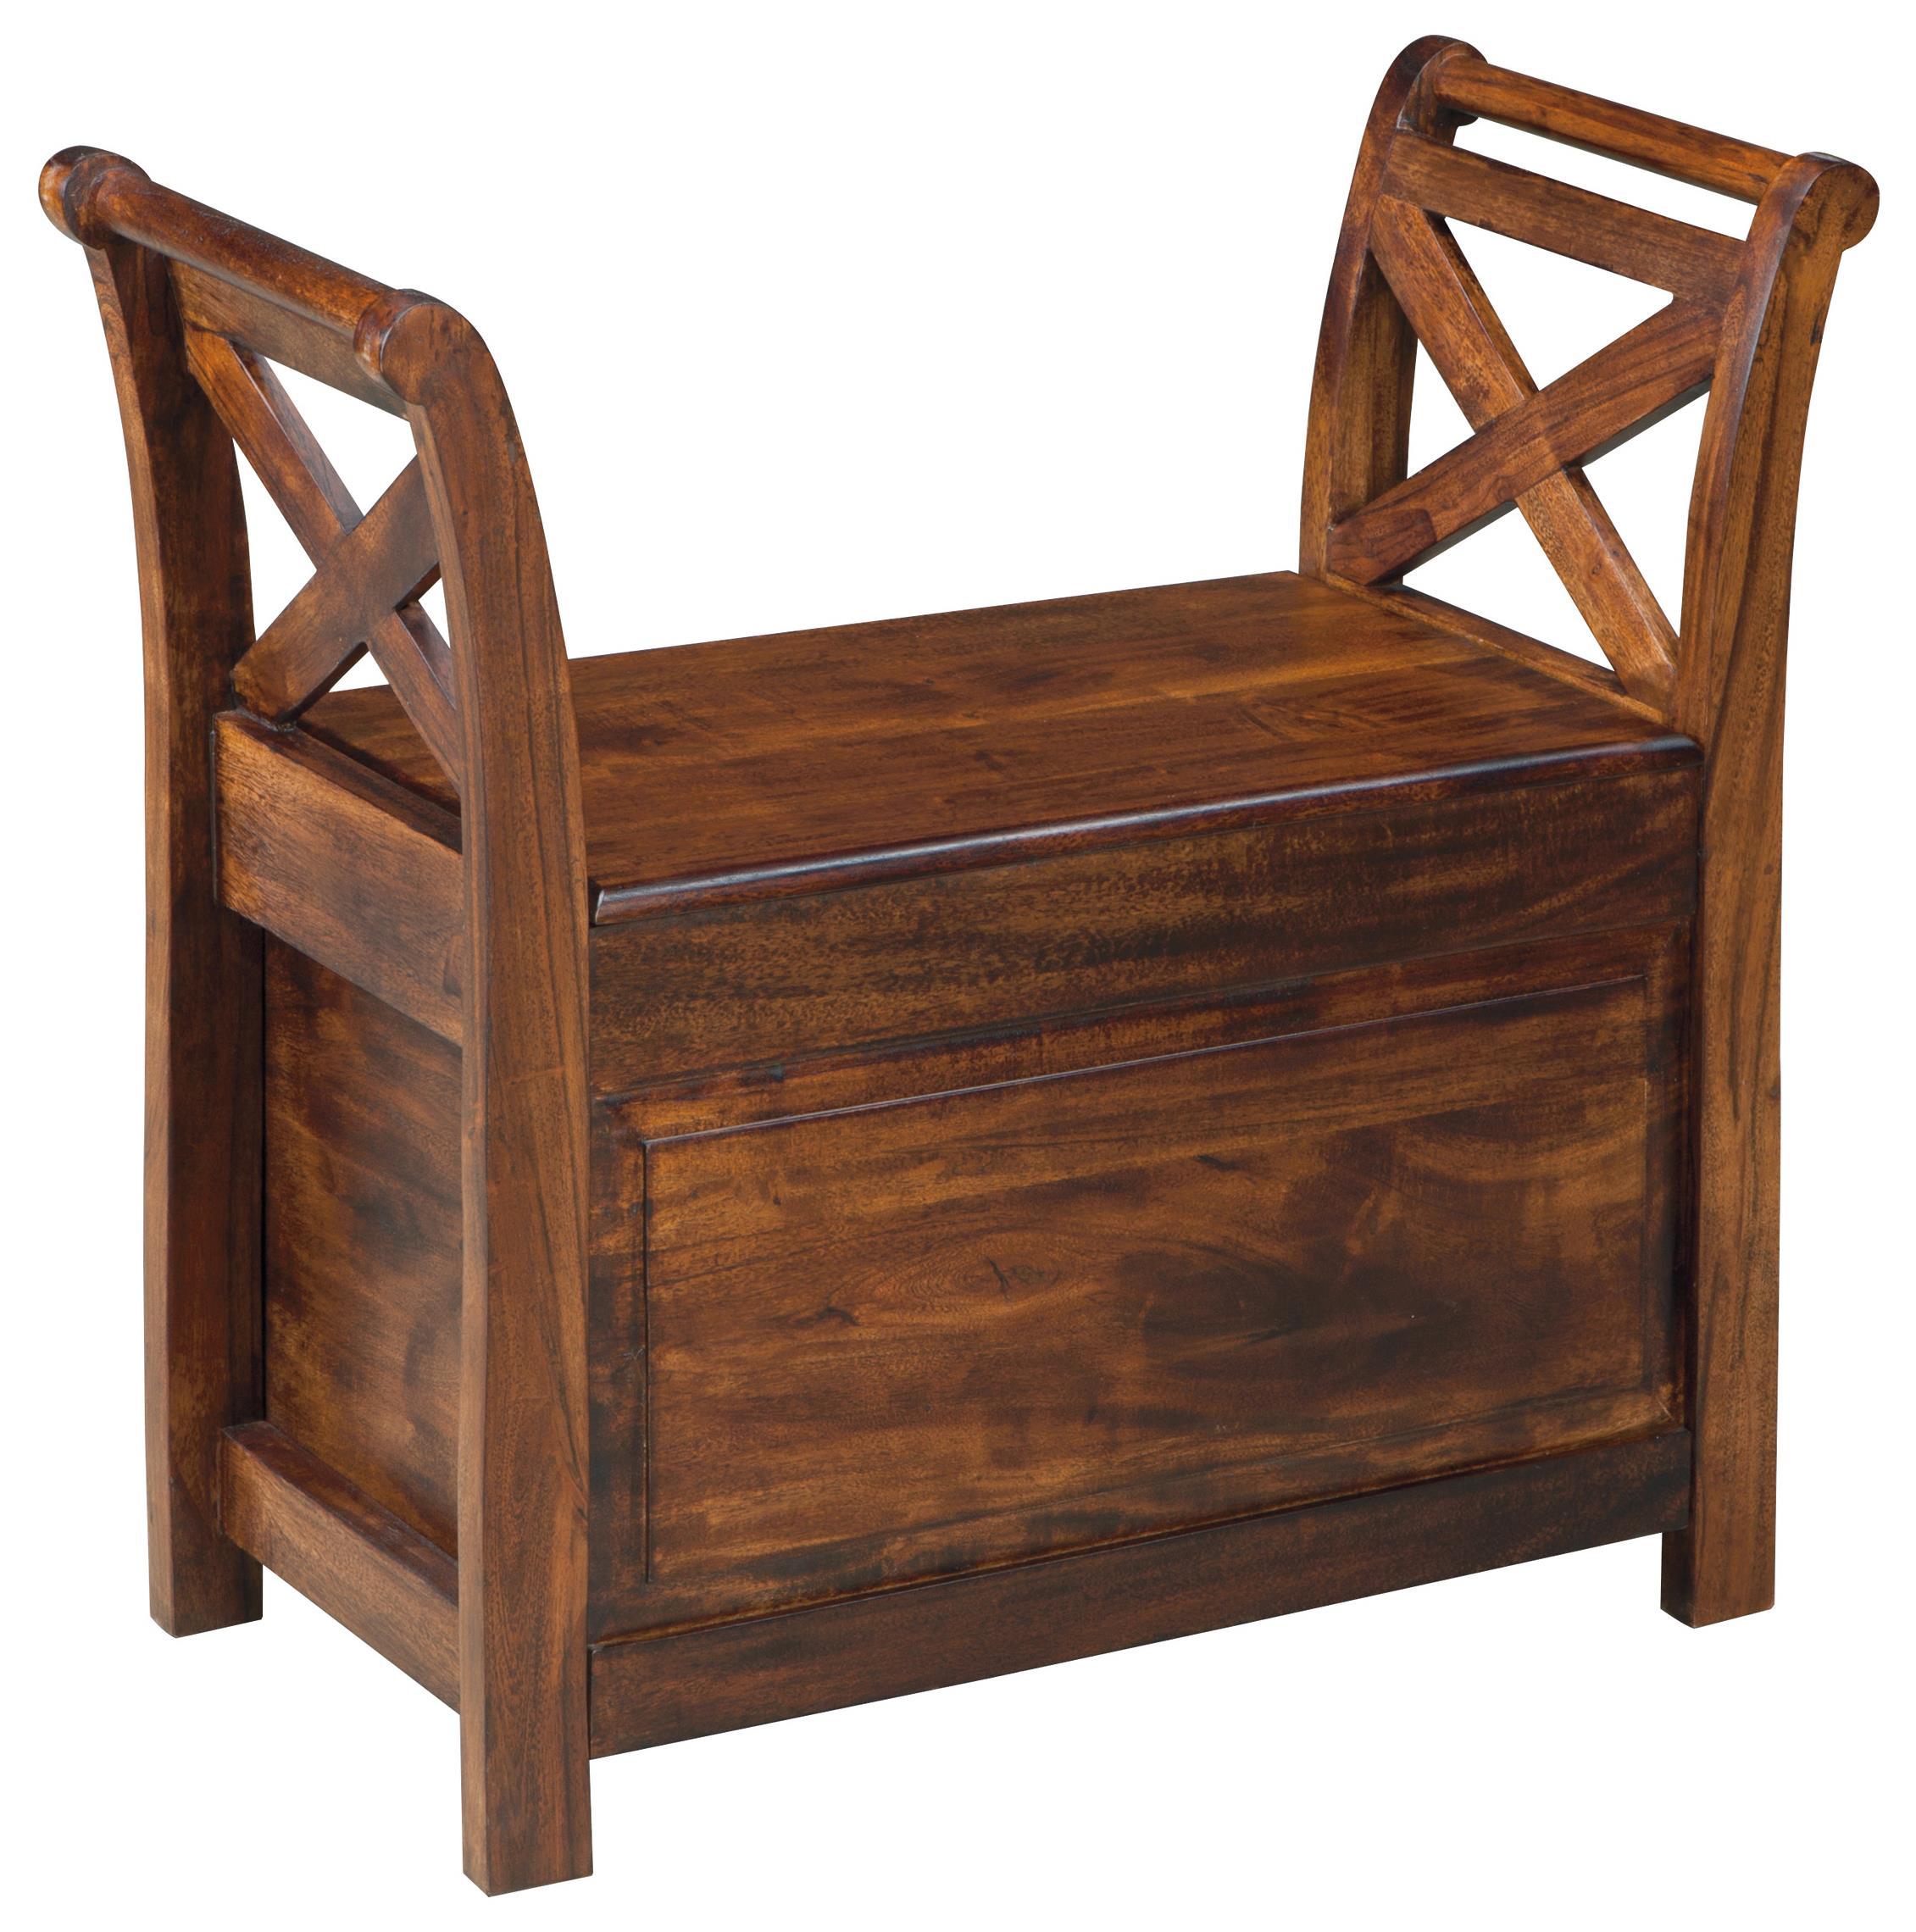 Mango Wood Bench with Storage